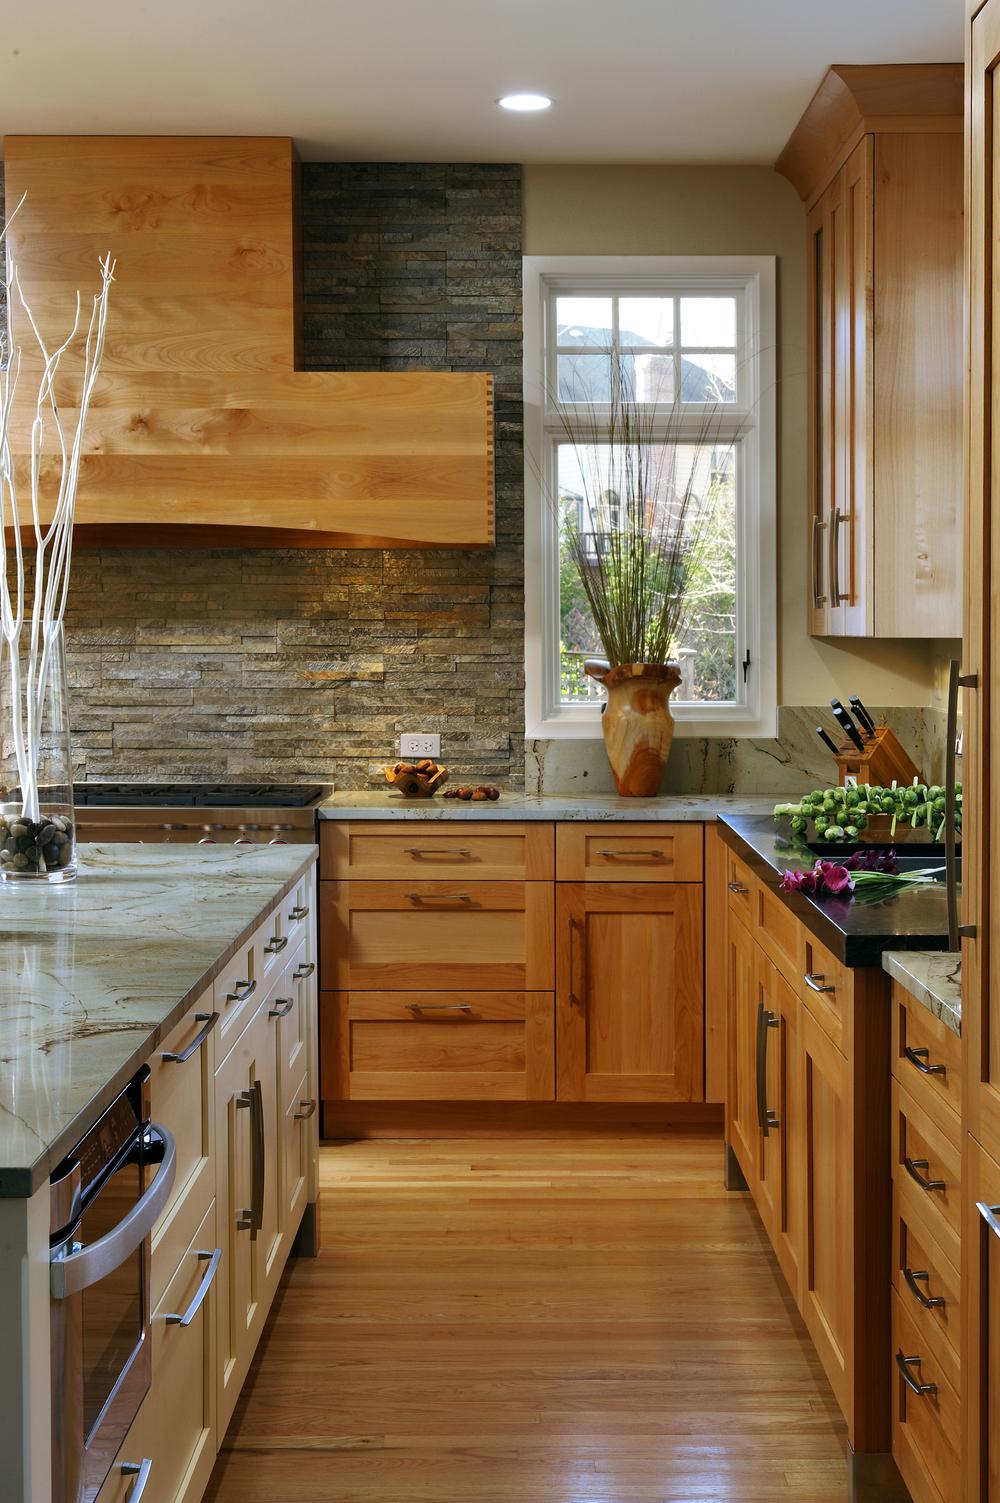 kitchen remodeling budgeting tips